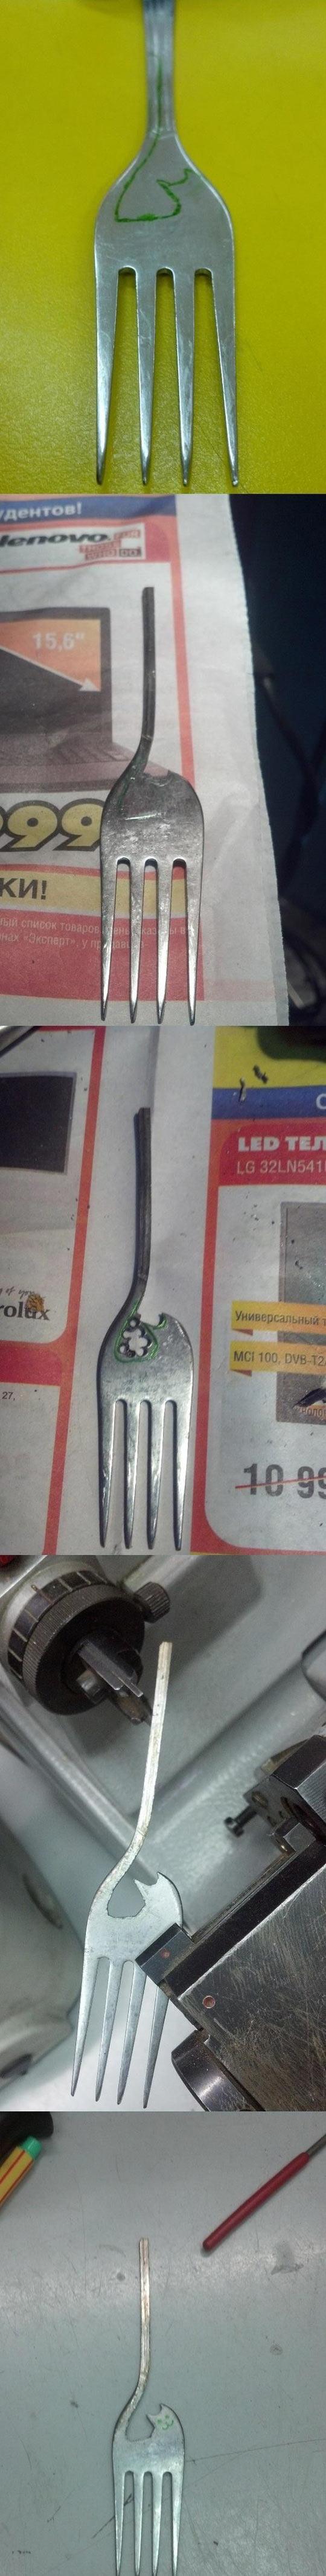 My Favorite Fork